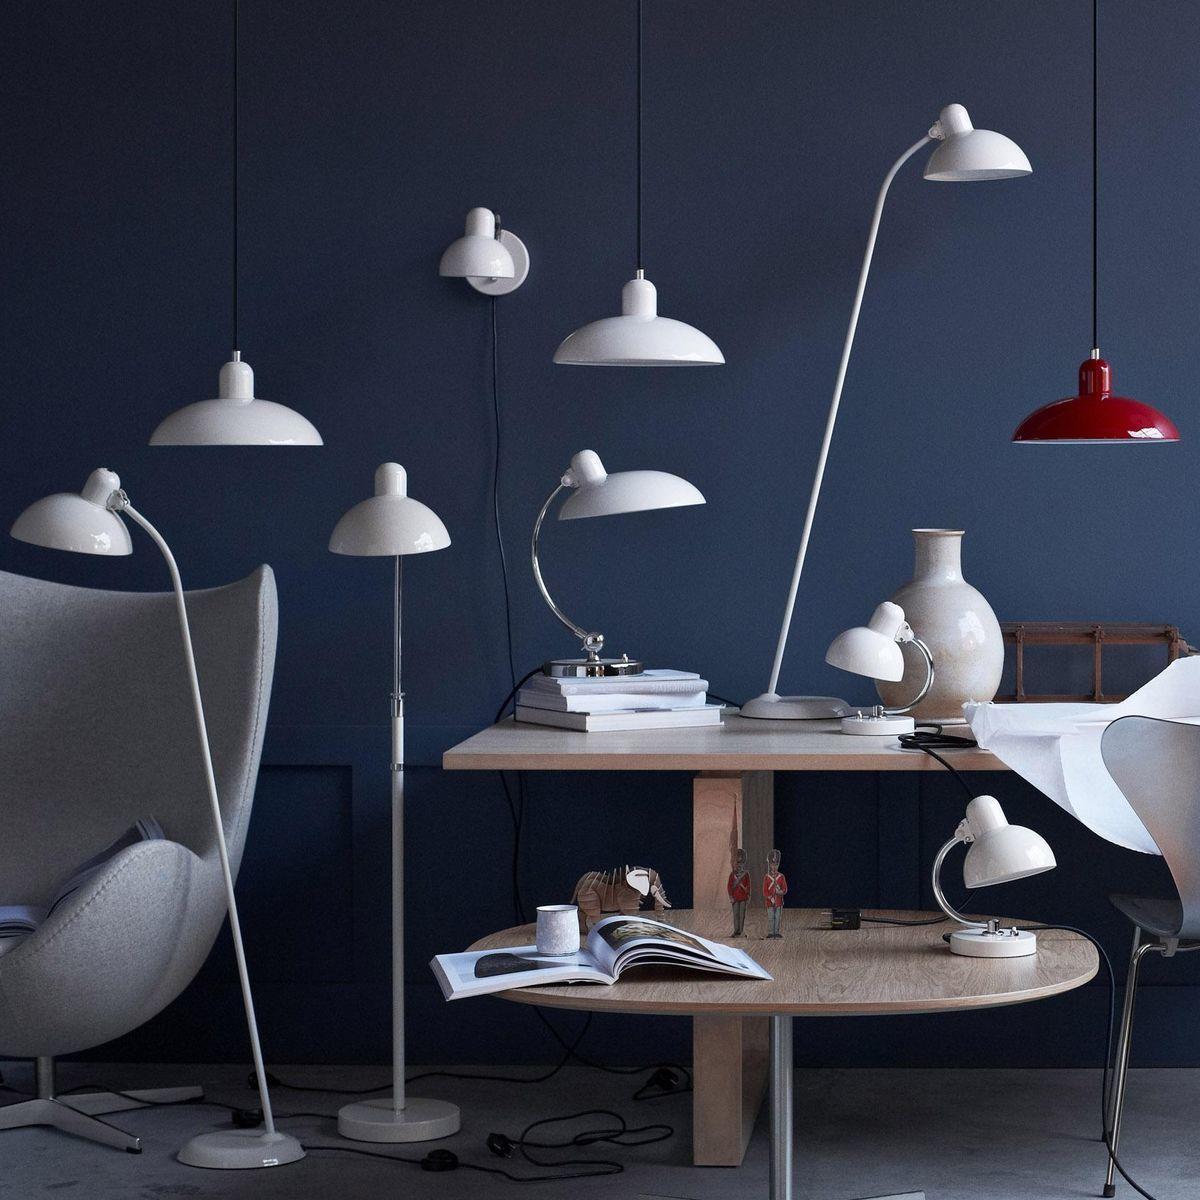 kaiser idell 6556 f super stehleuchte kaiser idell. Black Bedroom Furniture Sets. Home Design Ideas